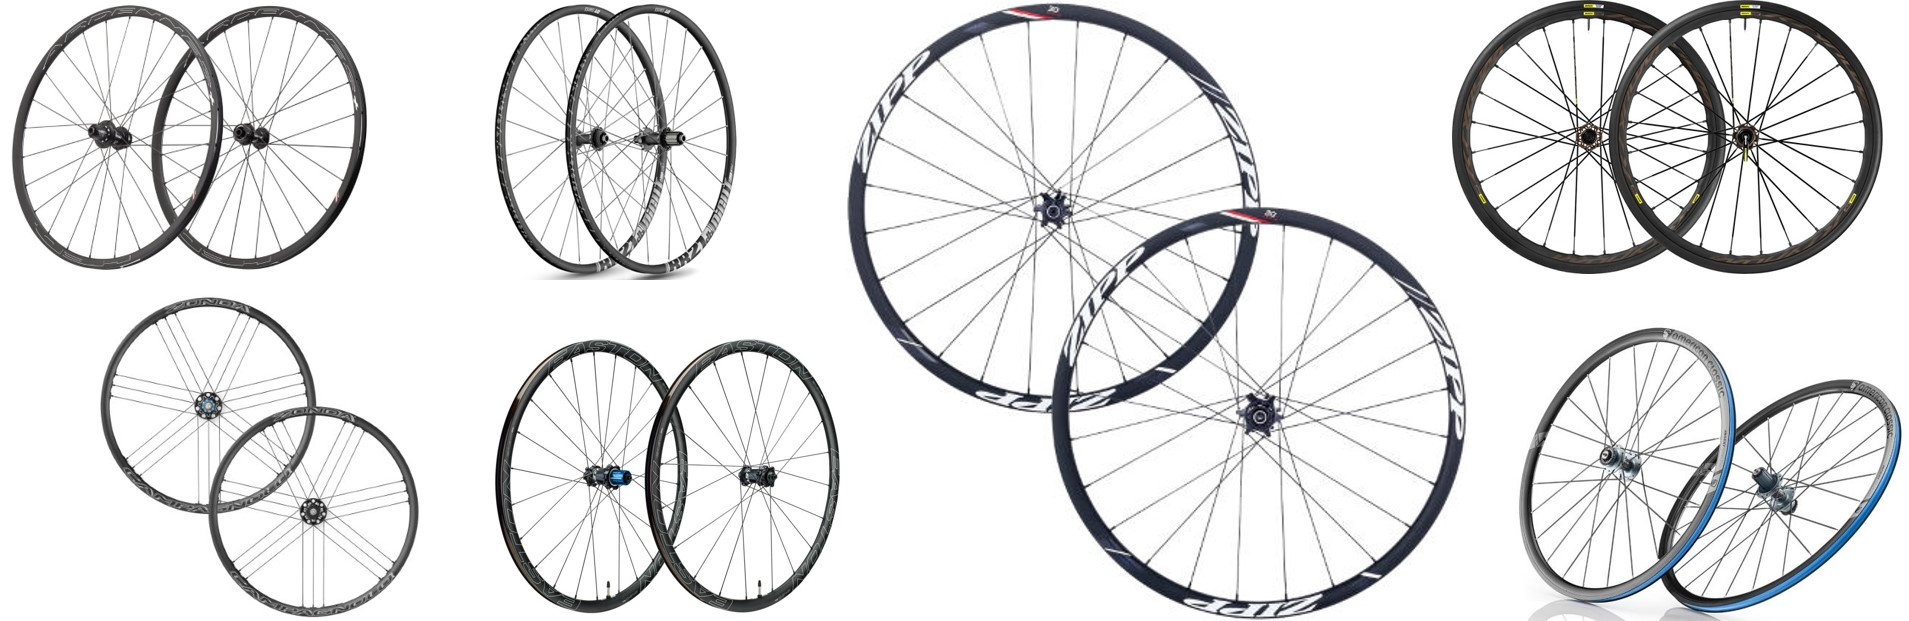 Best road bike wheels for you - Upgrade